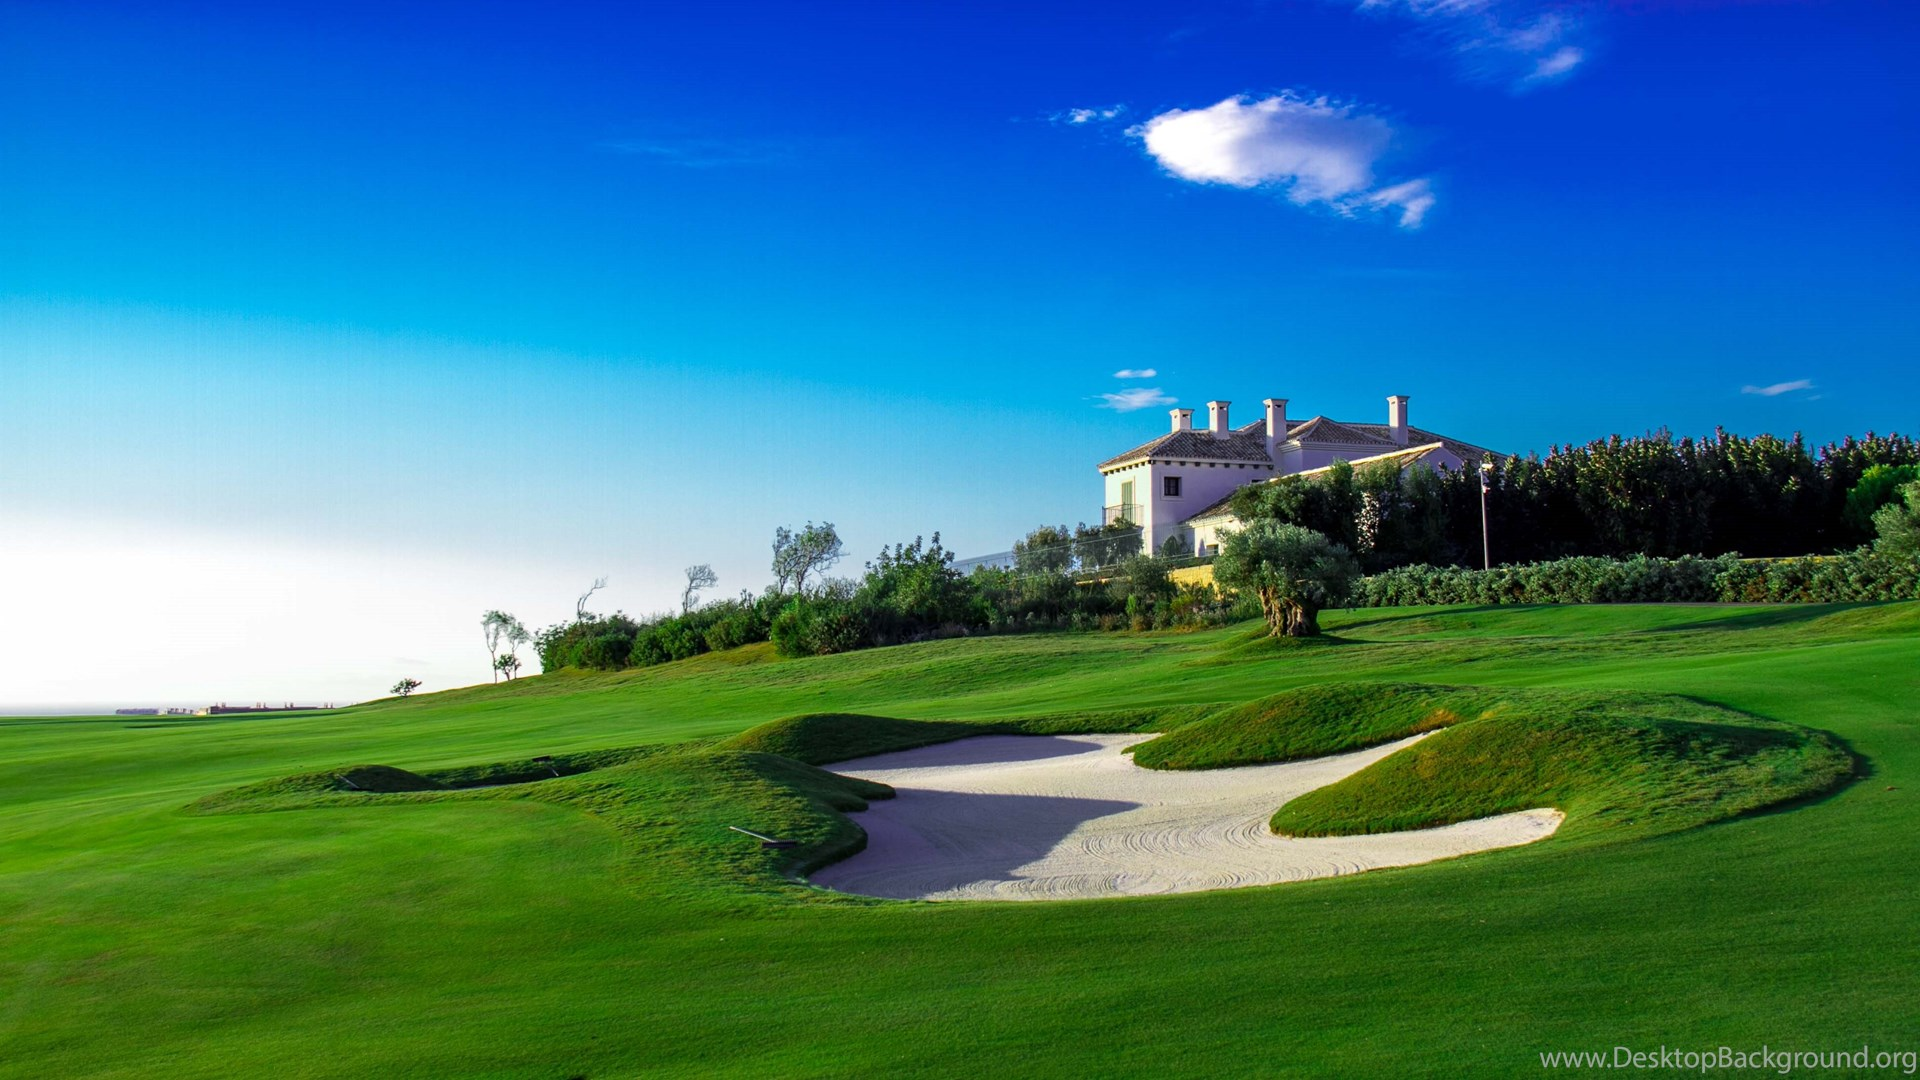 Golf Course Wallpapers Desktop Background